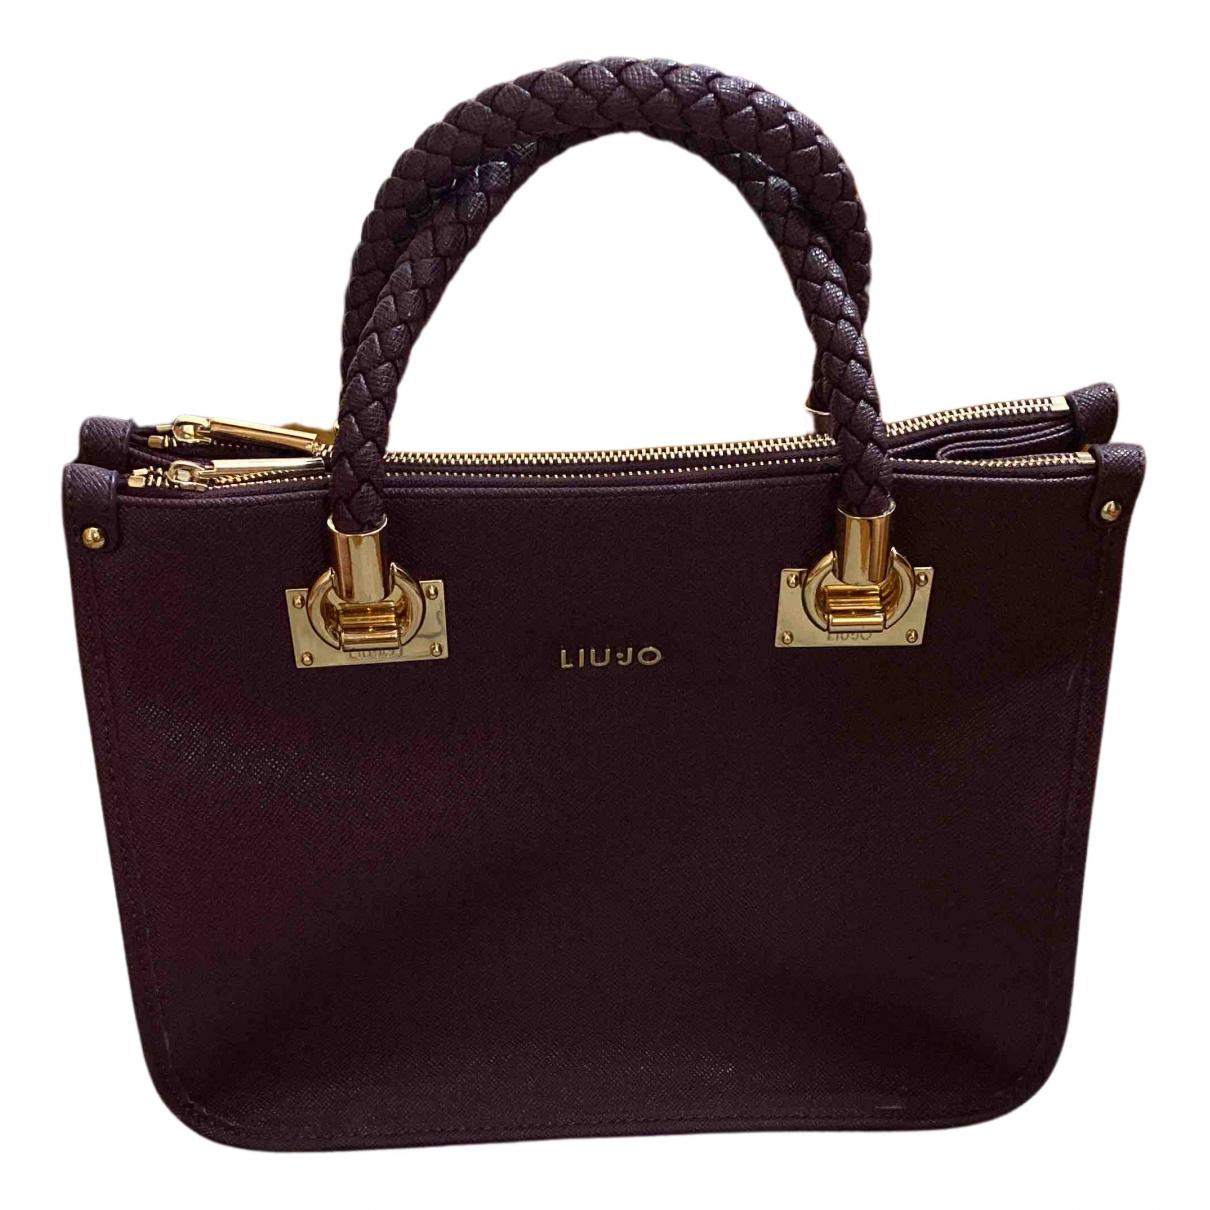 Liu.jo \N Burgundy handbag for Women \N